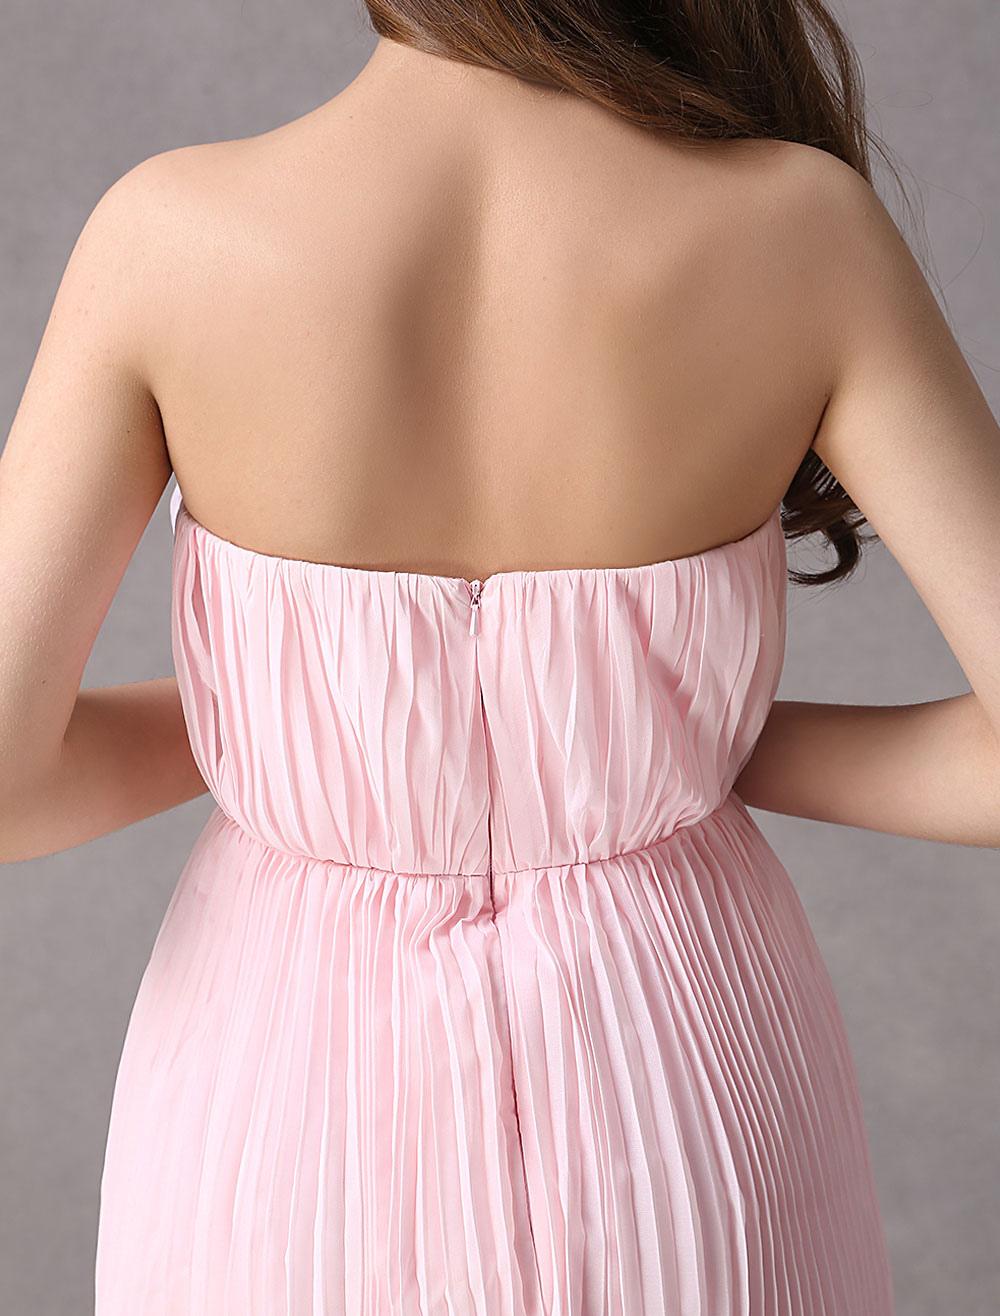 Vestido damas rosa de gasa ajustado sin tirantes hasta la rodilla ...